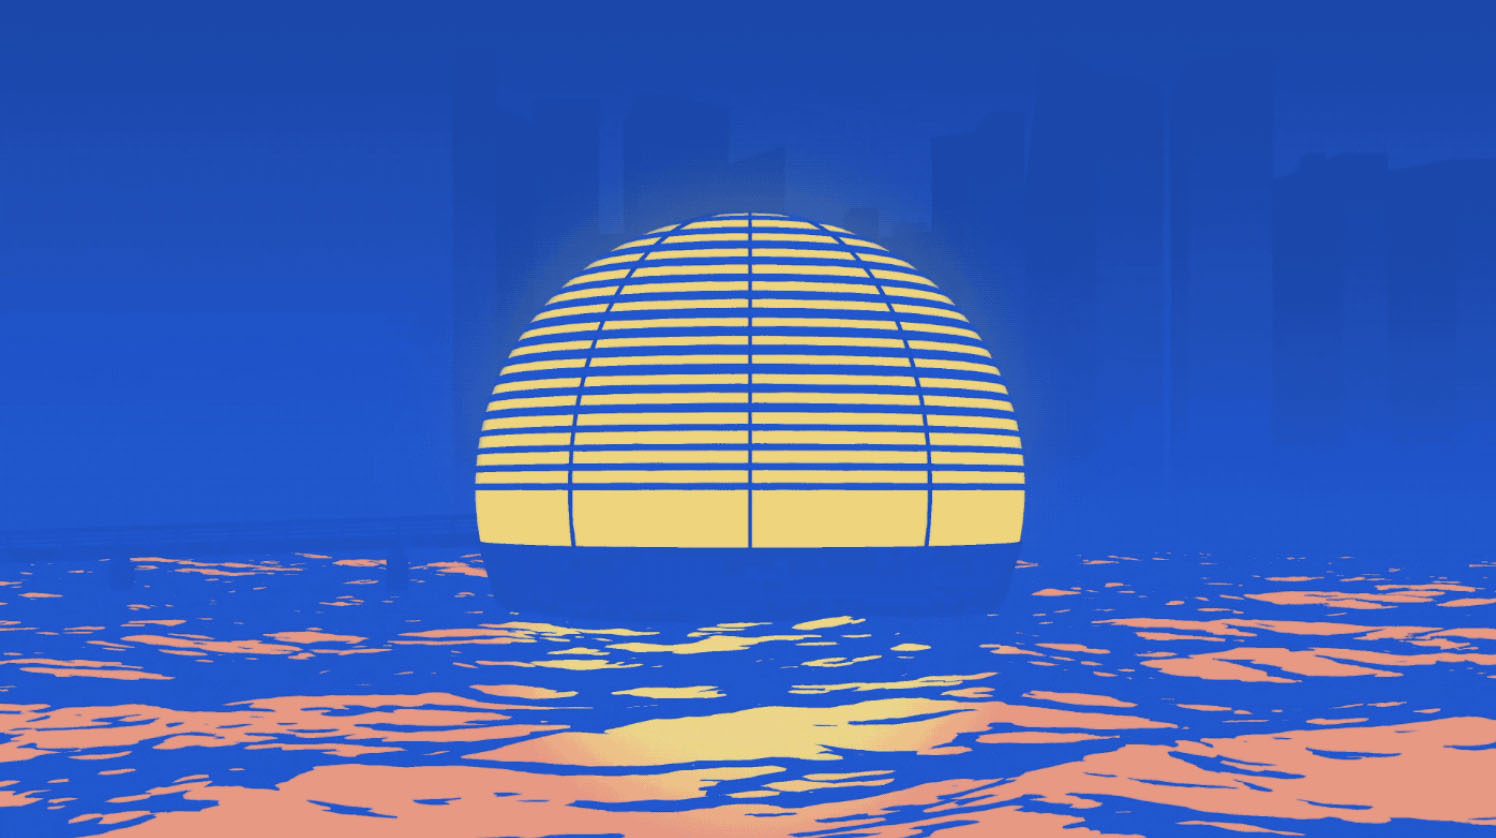 Apple Store Marina Bay Sands